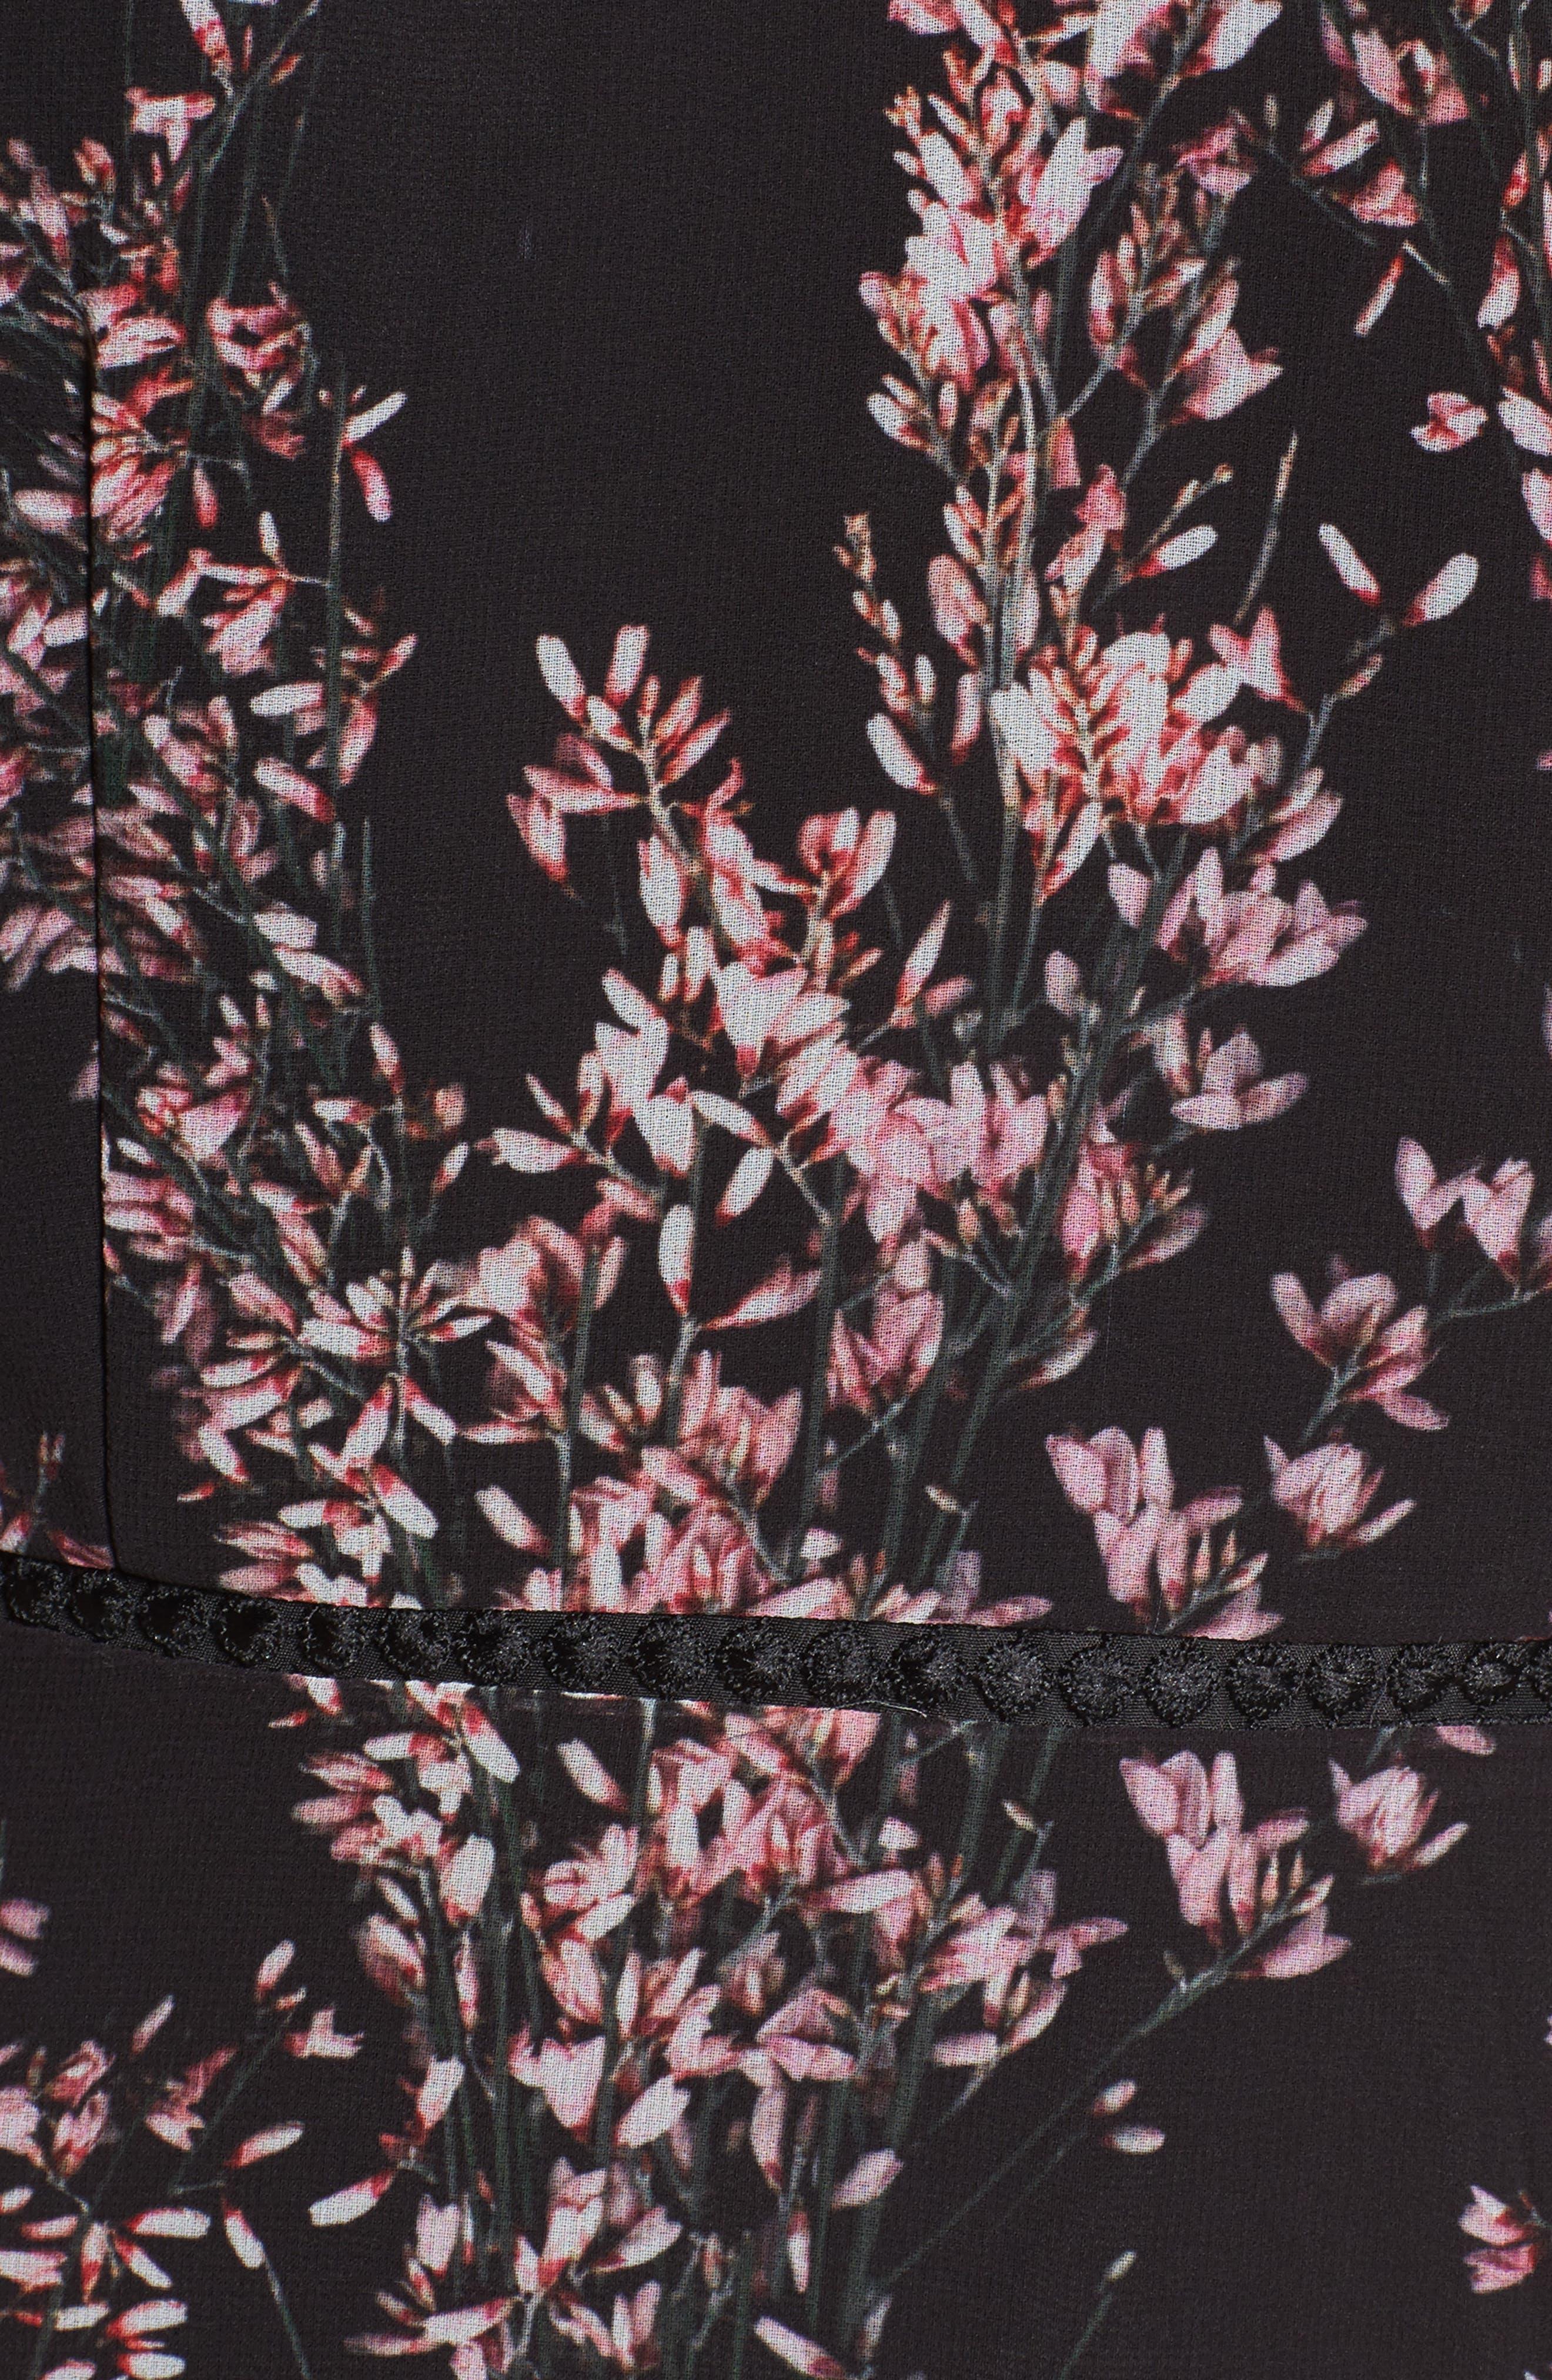 Light Up Ruffle Minidress,                             Alternate thumbnail 5, color,                             001